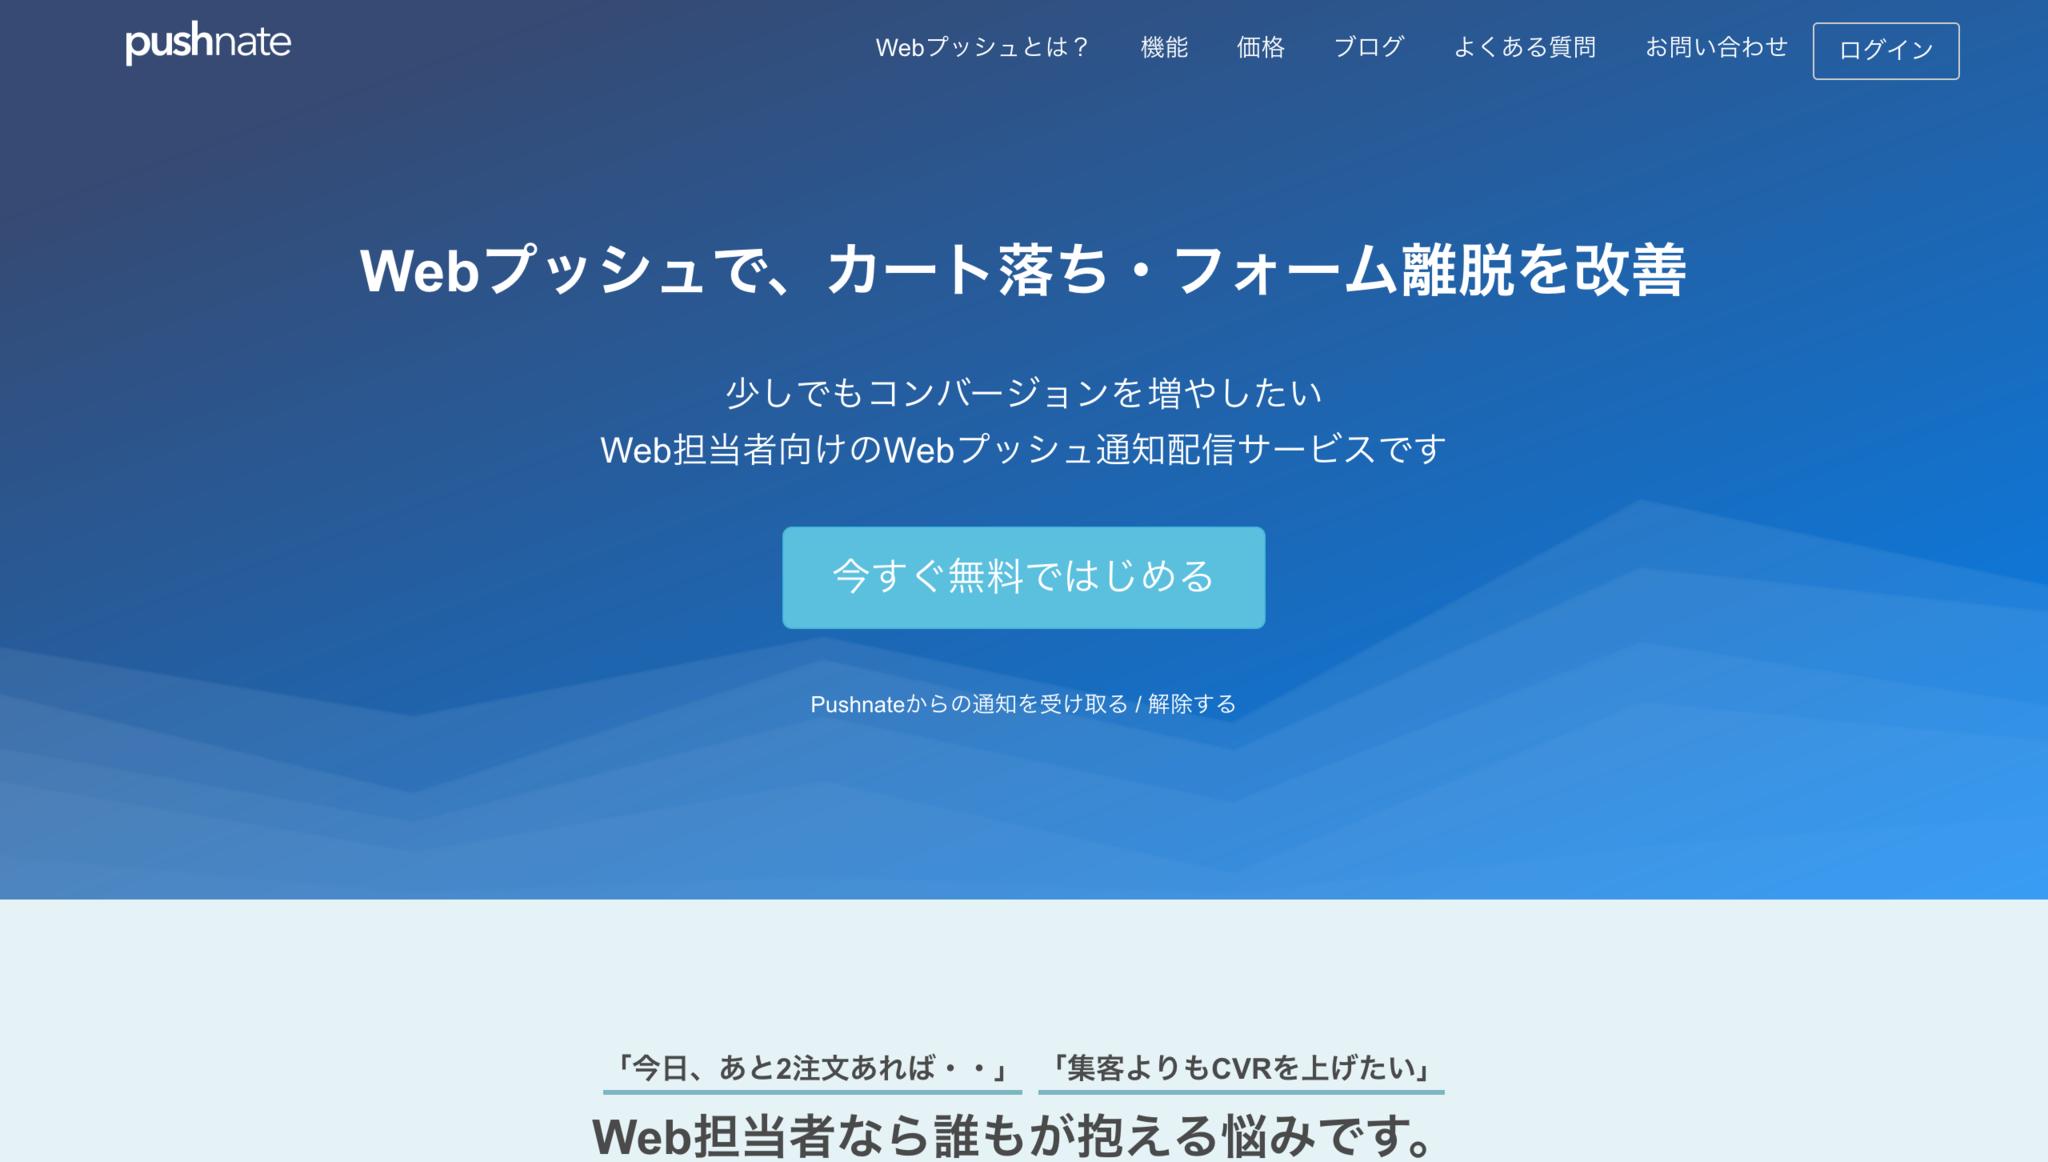 Pushnate|Webプッシュ通知でコンバージョン率を改善.png